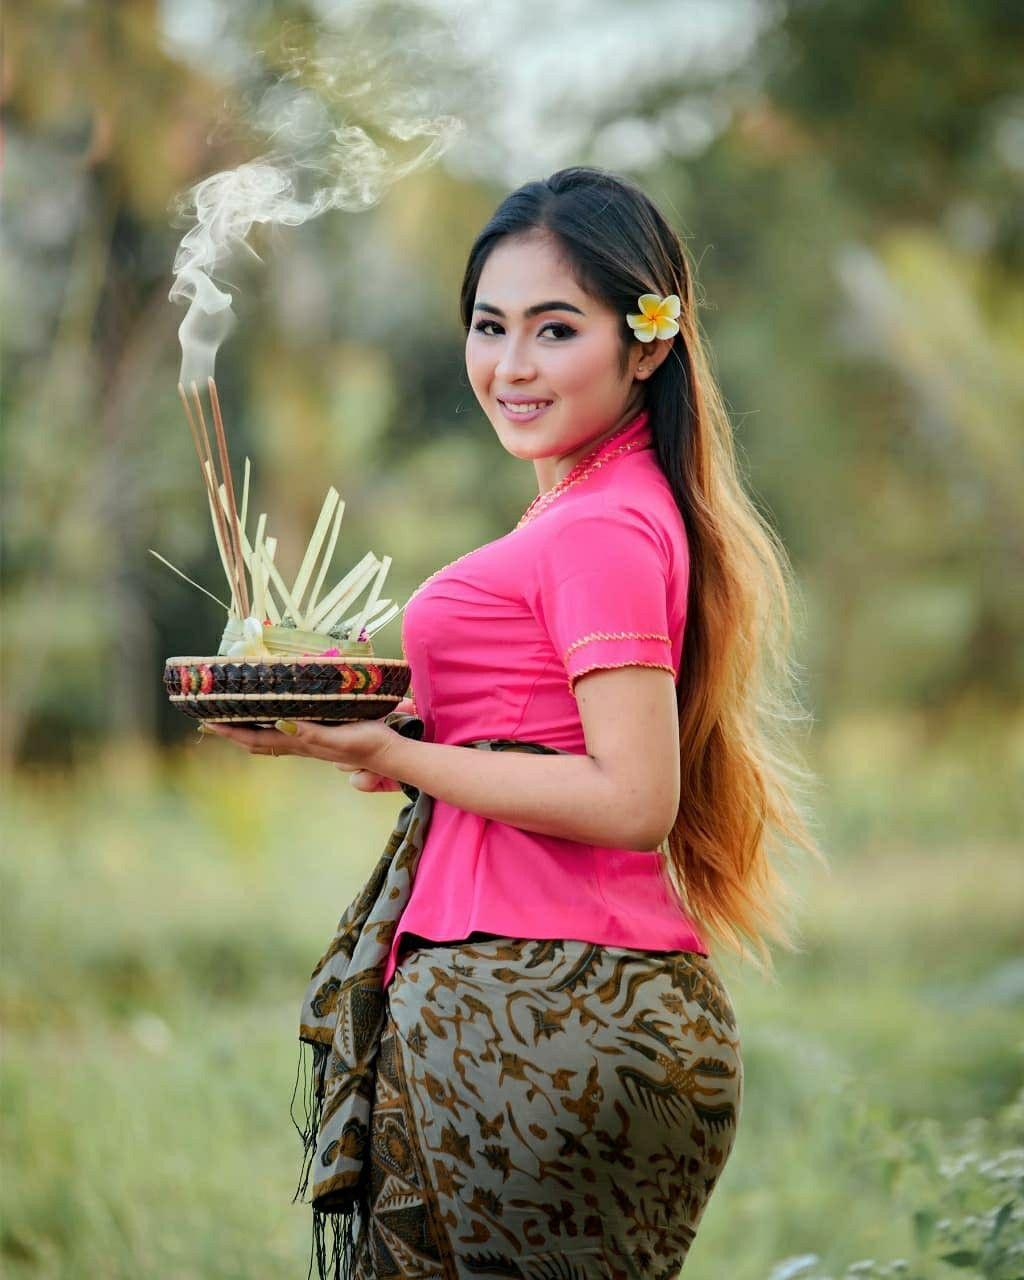 @smacantik.id - Cewe-Cewe SMA Cantik - kamis manis 😊😊😊